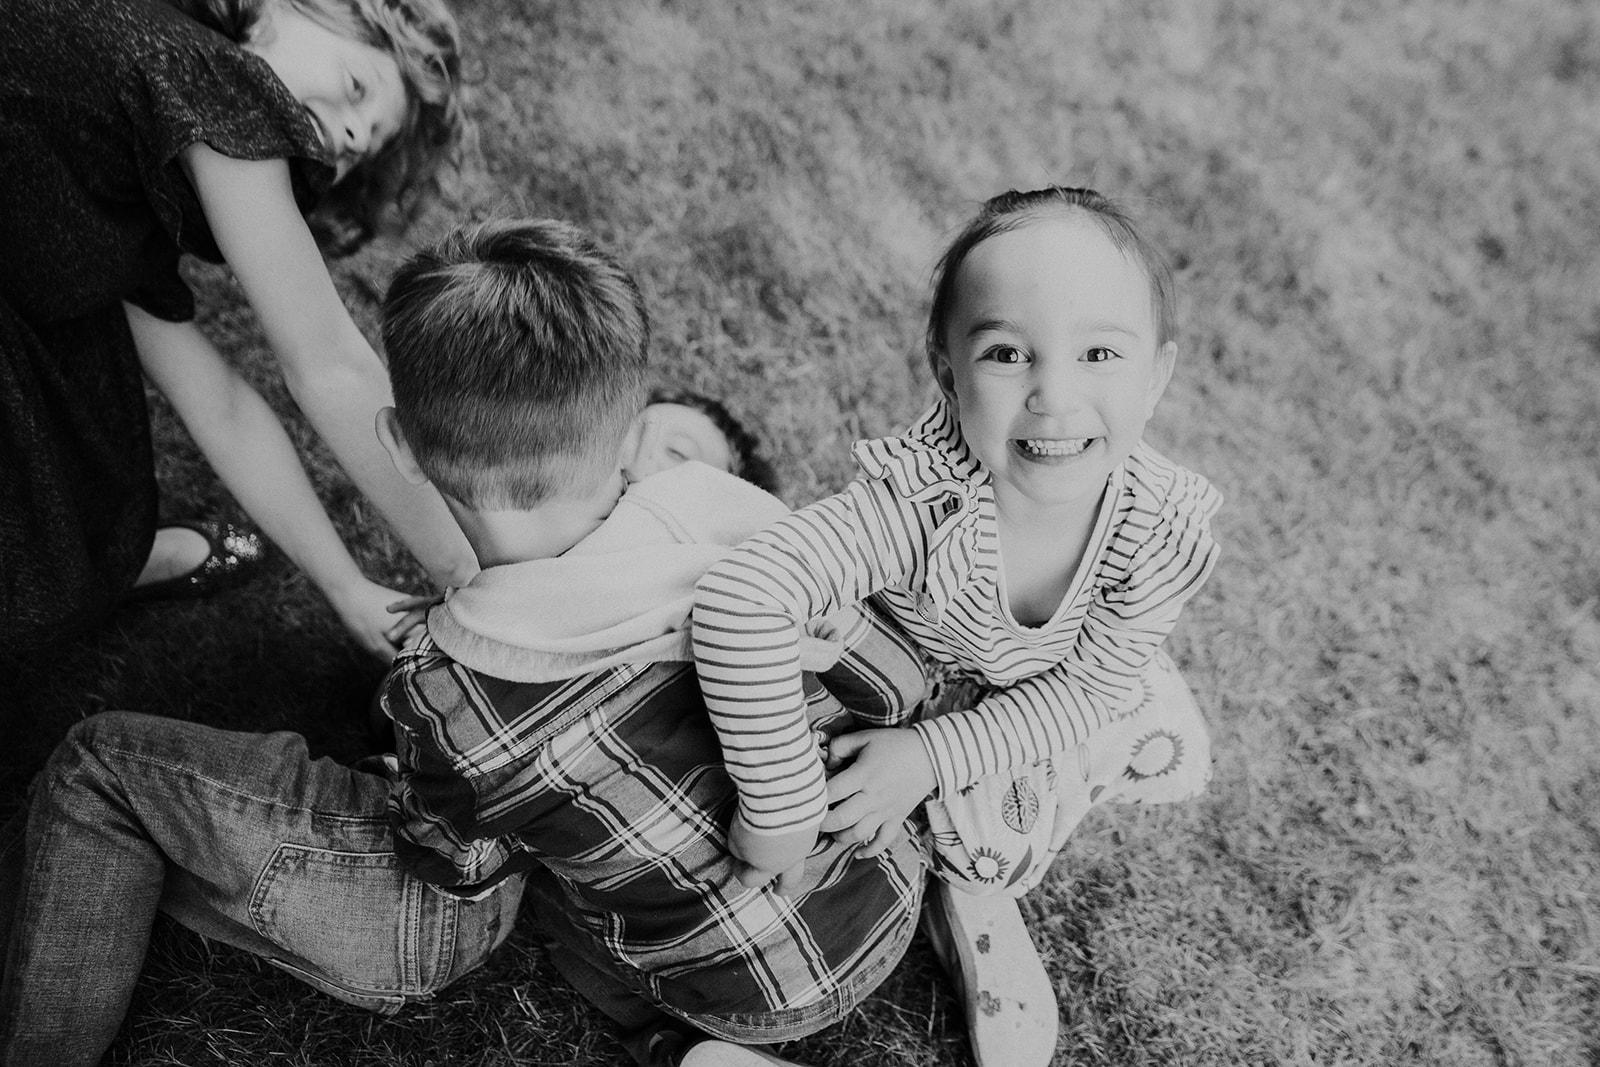 Family_Cabin_Photoshoot95.jpg